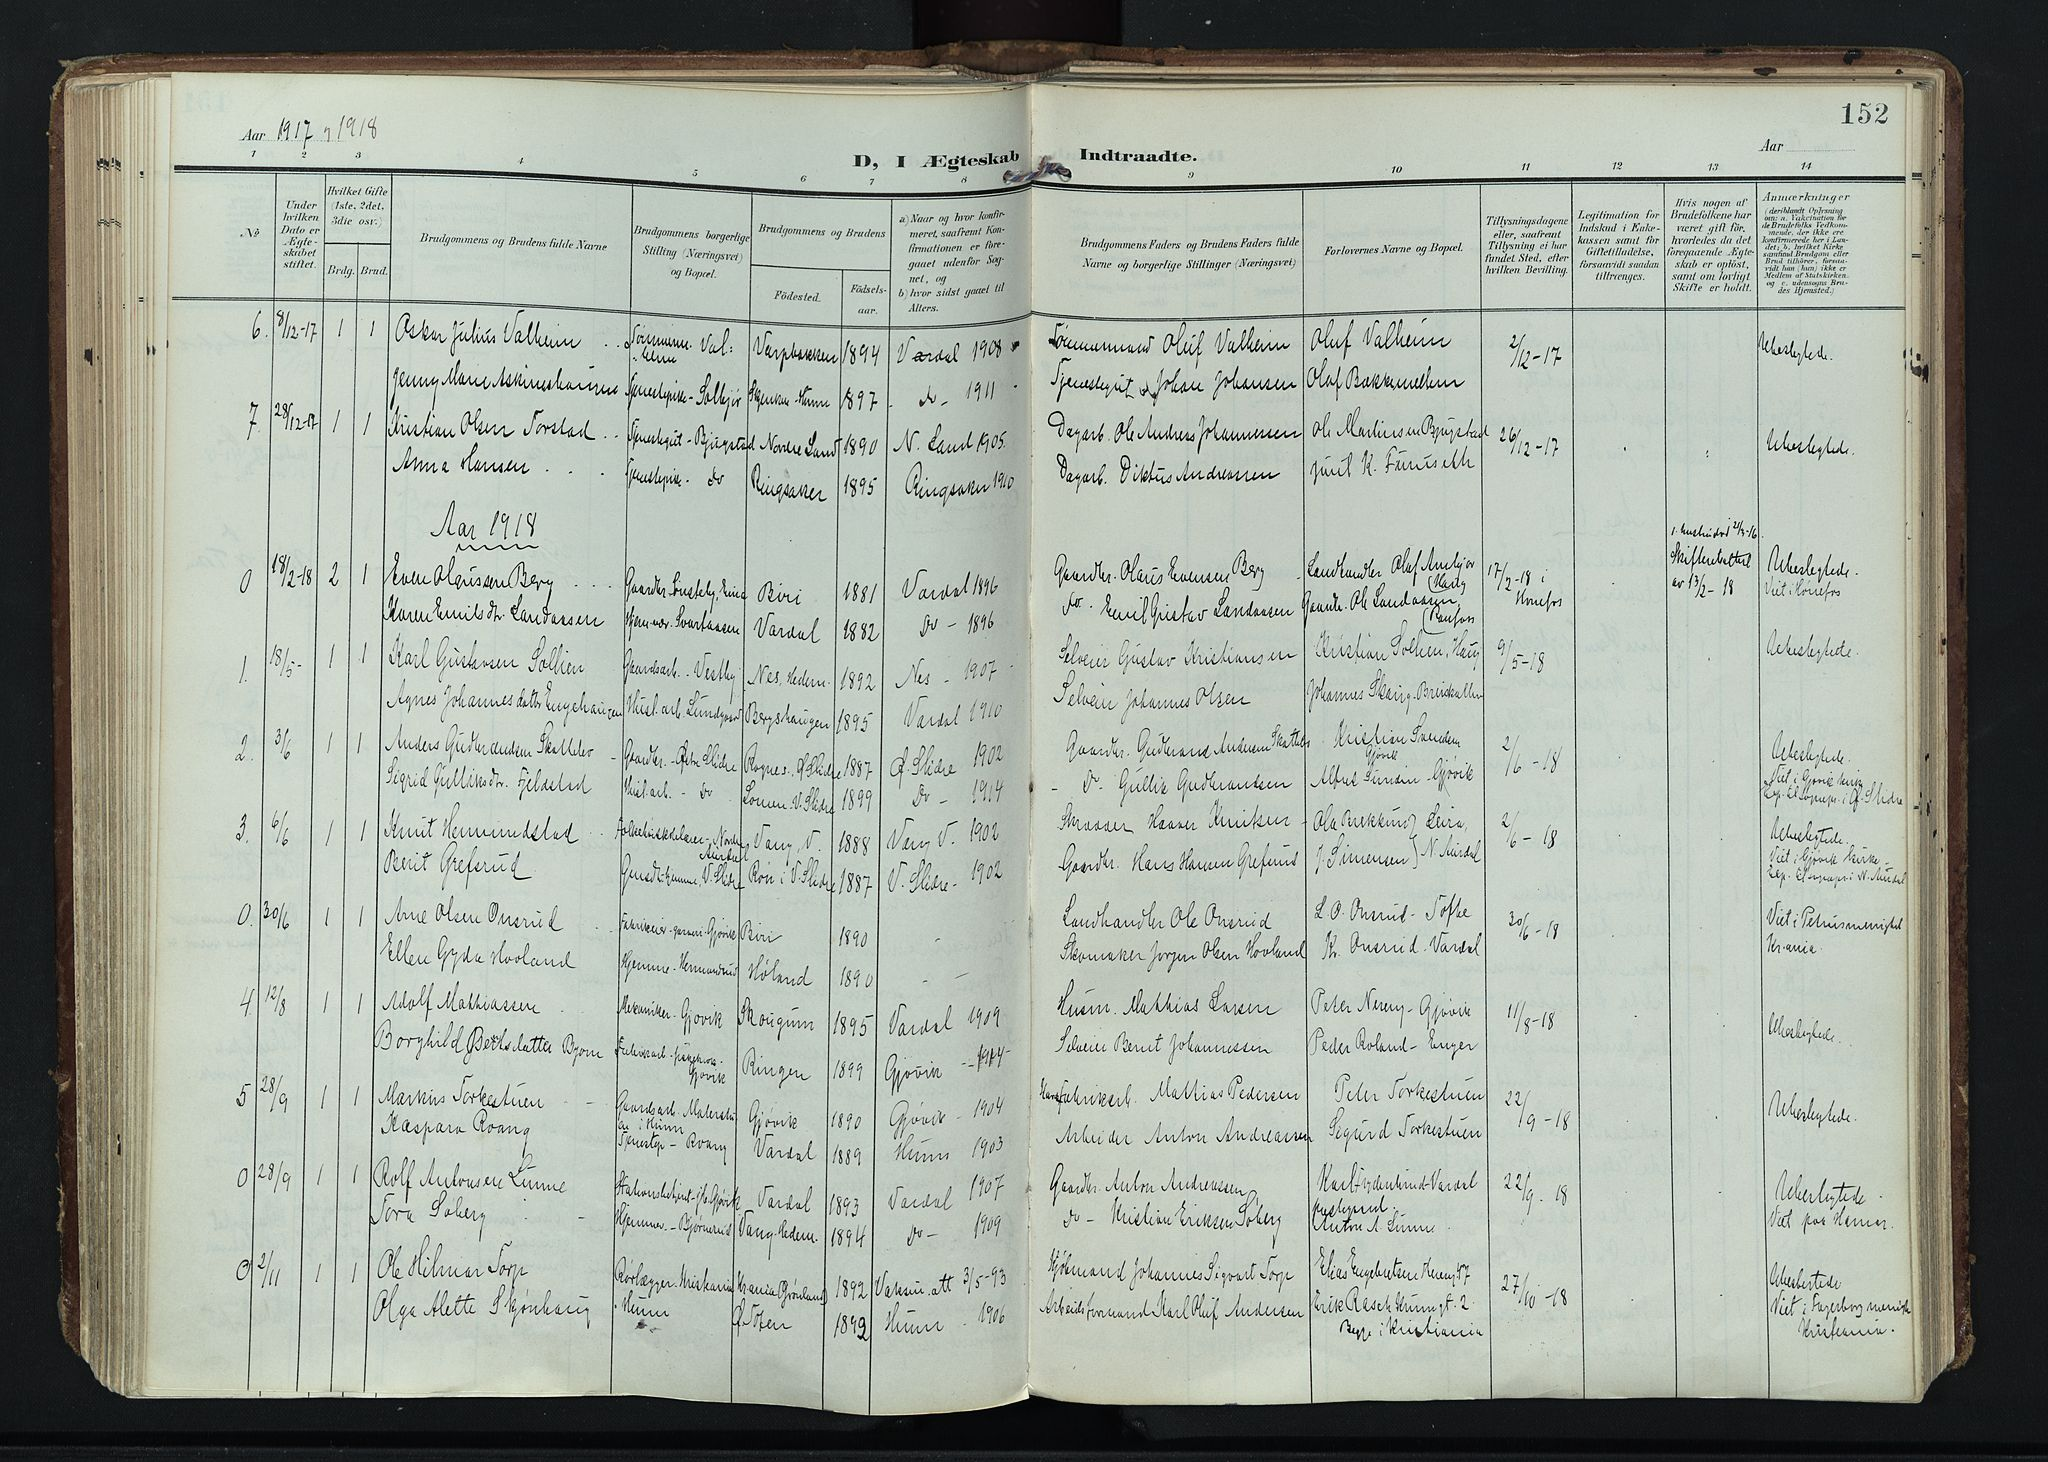 SAH, Vardal prestekontor, H/Ha/Haa/L0020: Ministerialbok nr. 20, 1907-1921, s. 152